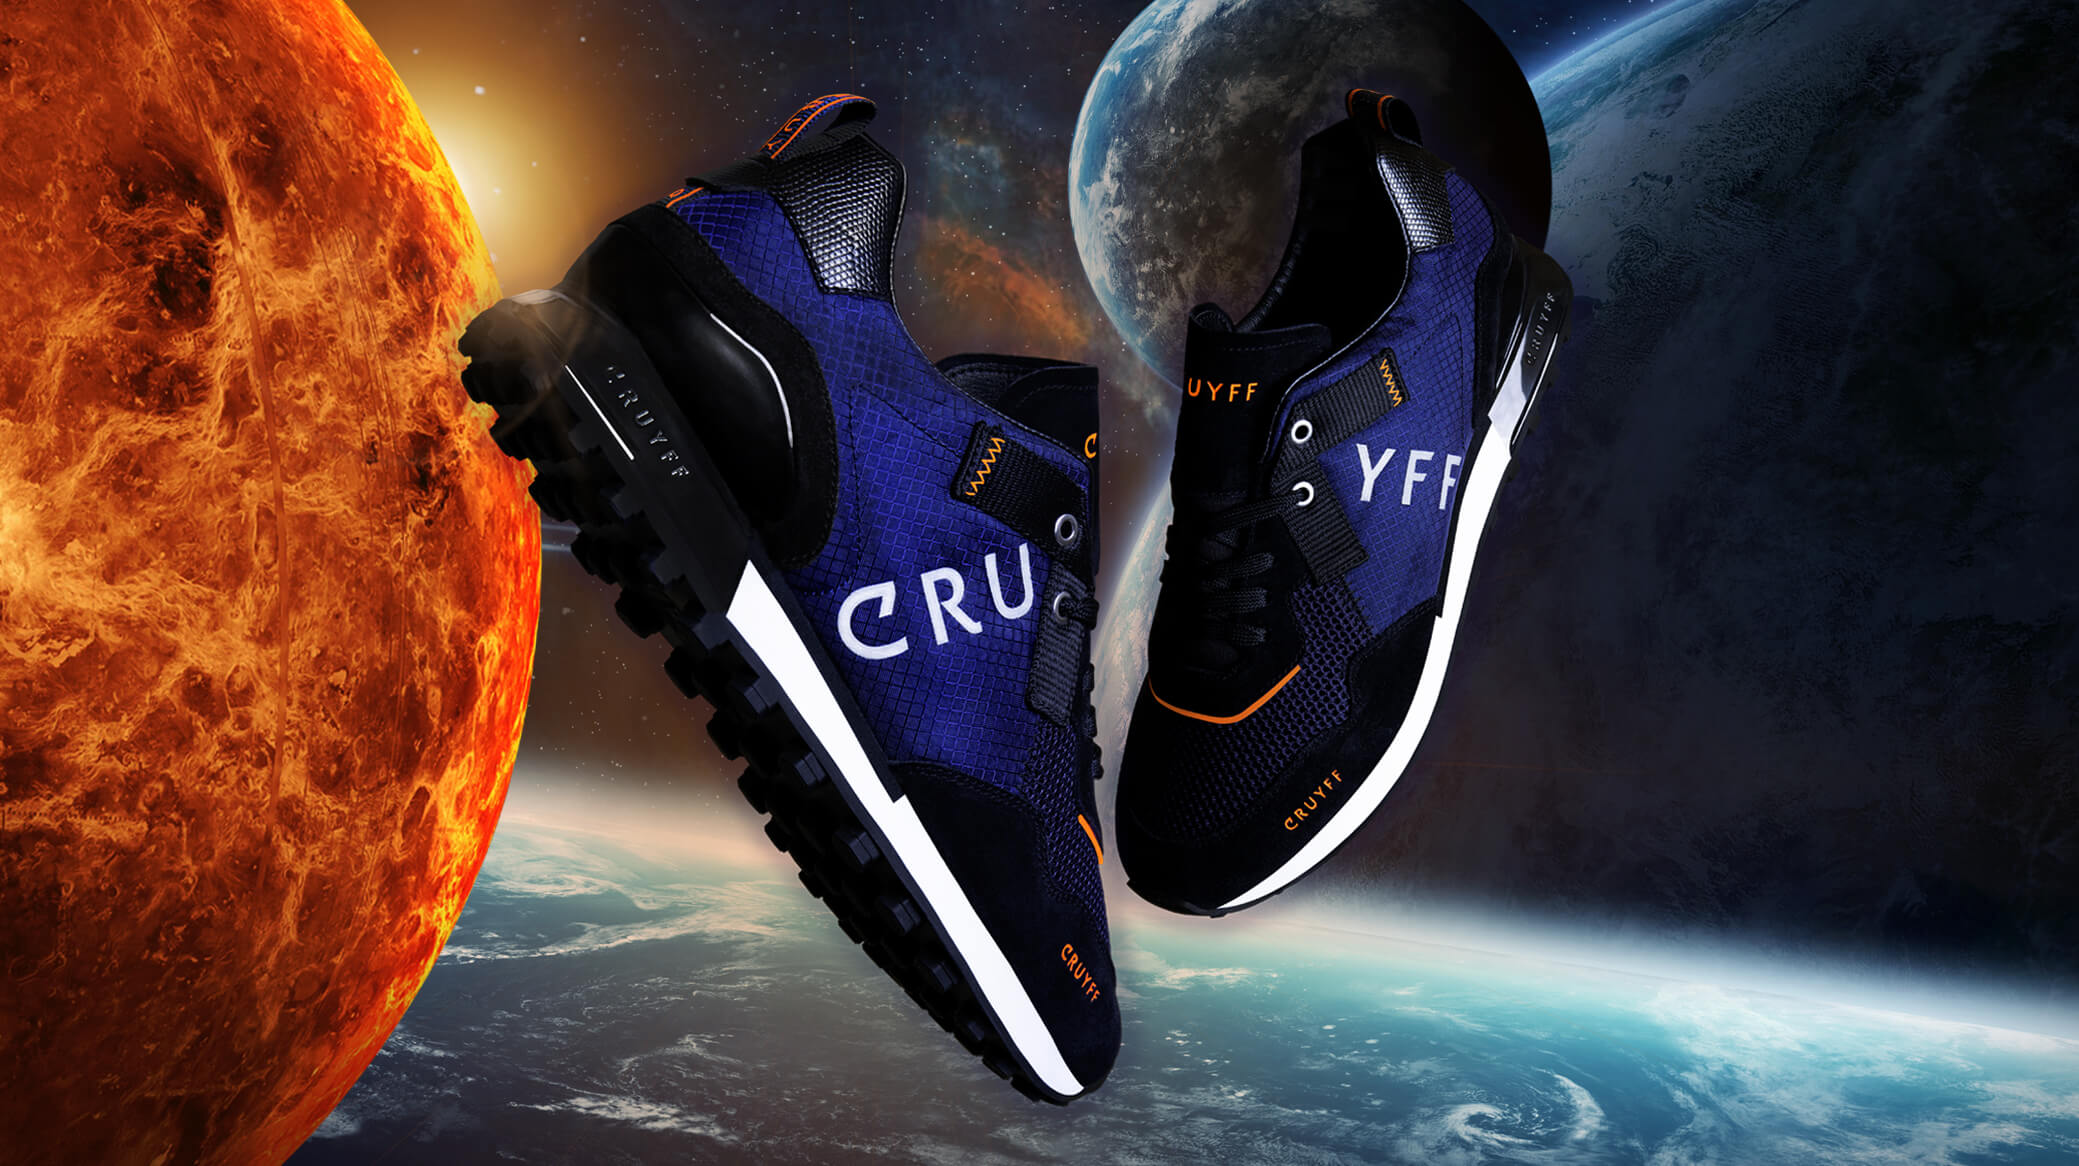 Cruyff Infinity Capsule